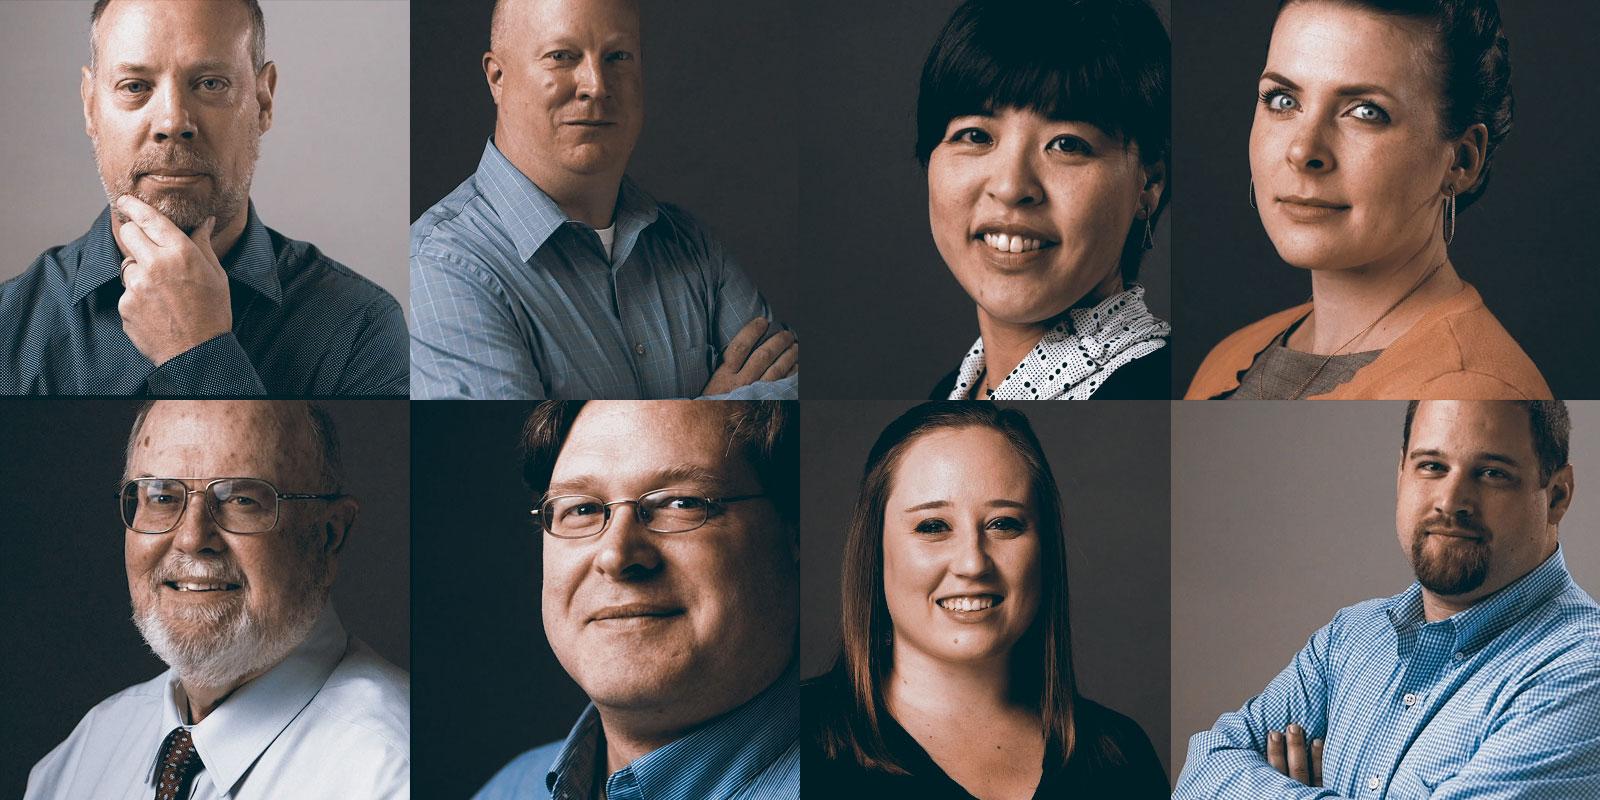 Wine Industry - CPA Services Team, Doty Pruett Wilson, DPW